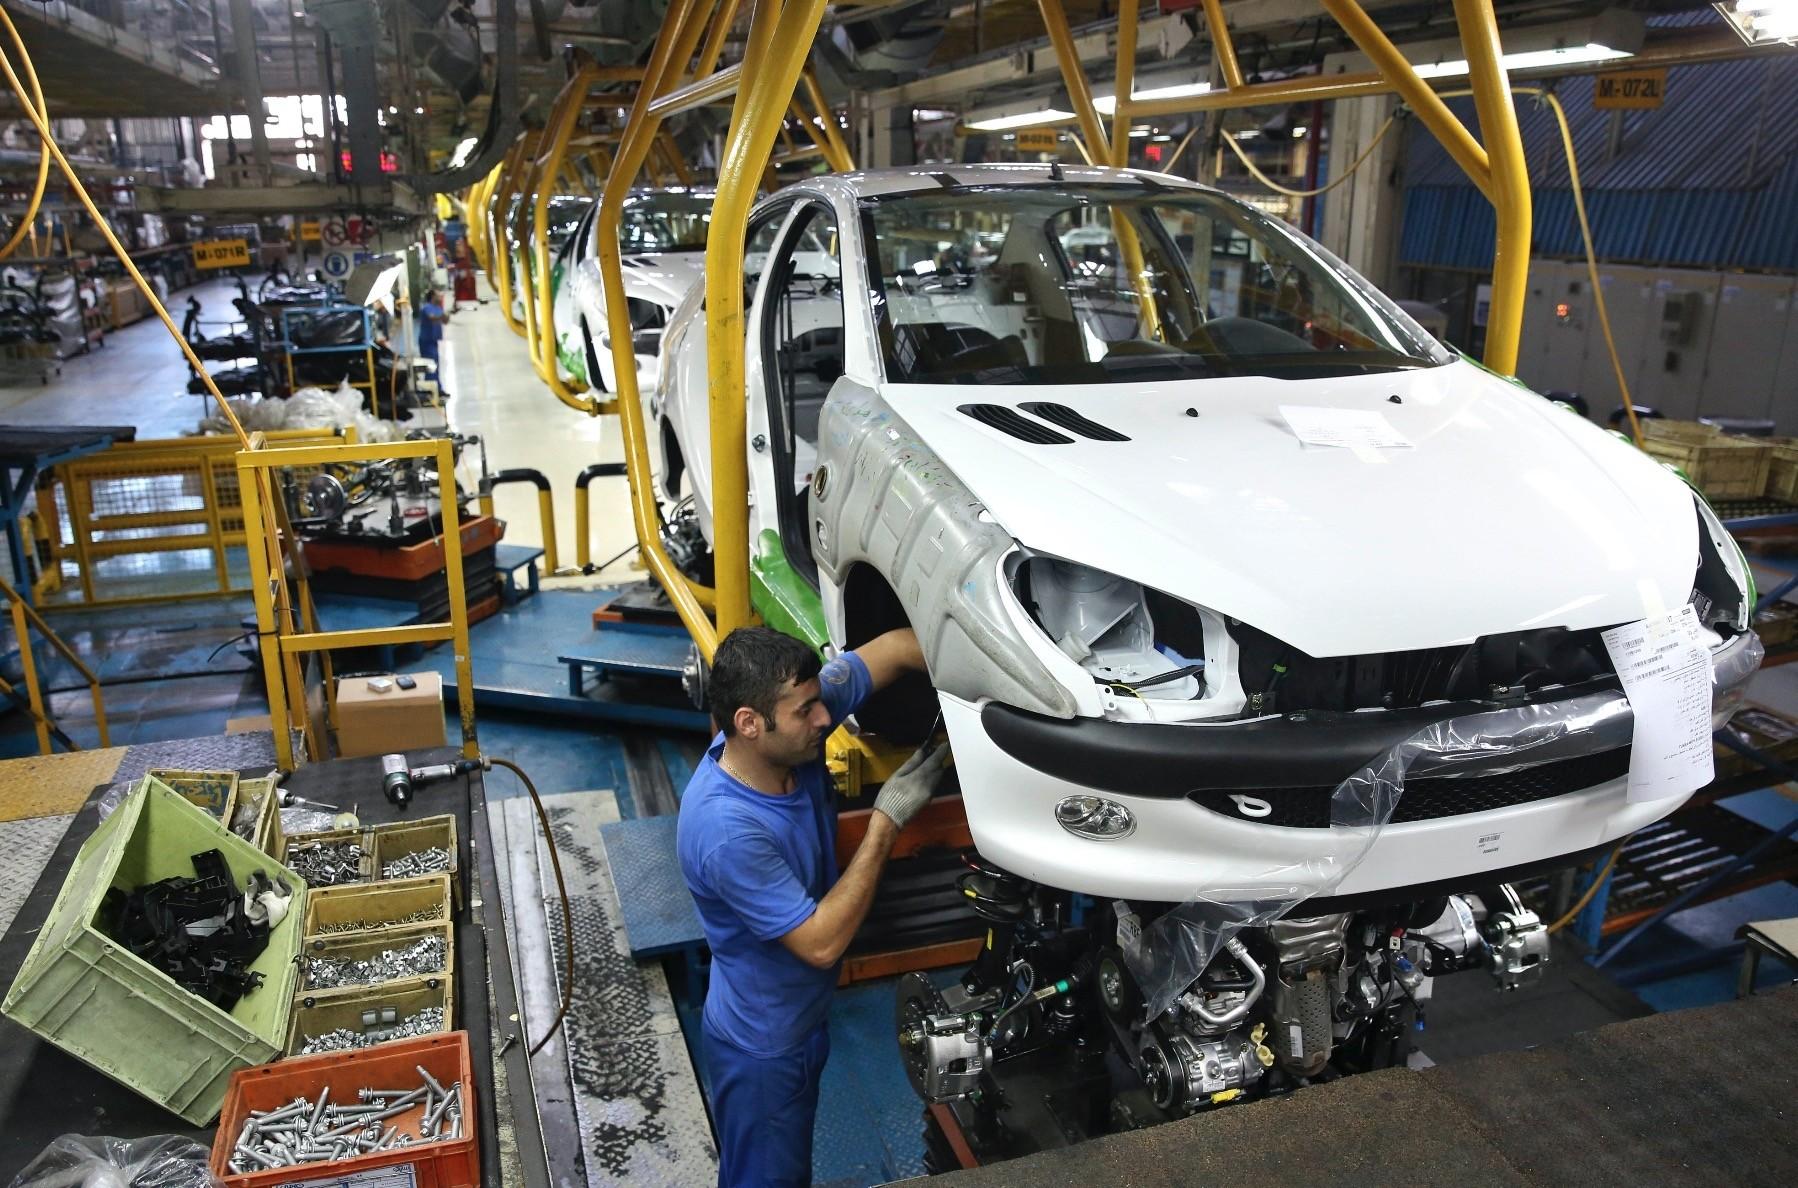 An Iranian worker assembles a Peugeot 206 at the state-run Iran-Khodro automobile manufacturing plant near Tehran, Iran.